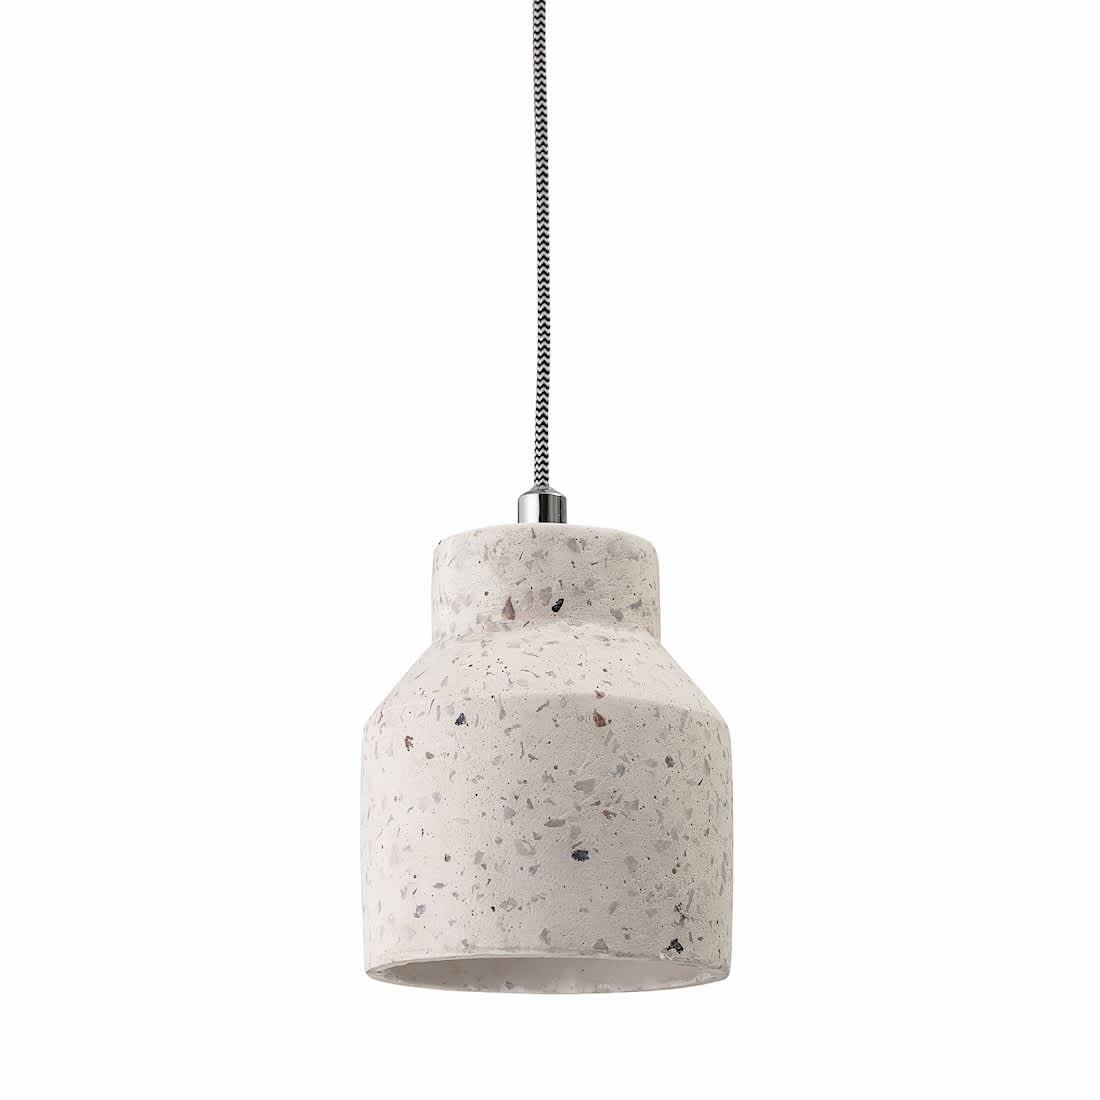 Bloomingville Natural White Concrete Pendant Light